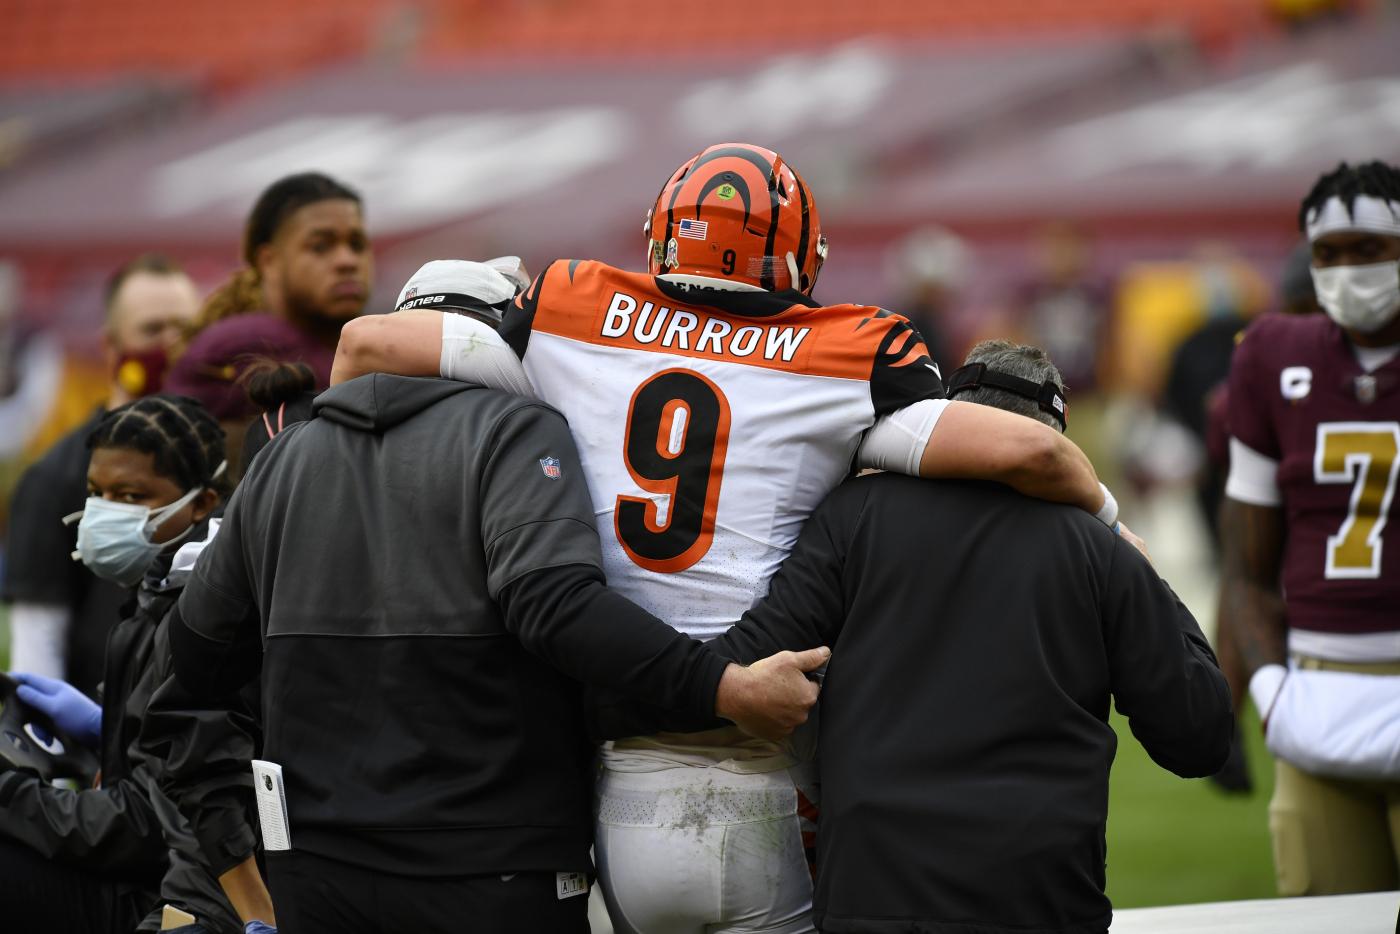 Joe Burrow Can Blame the Cincinnati Bengals for Foolishly Allowing His Injury To Happen